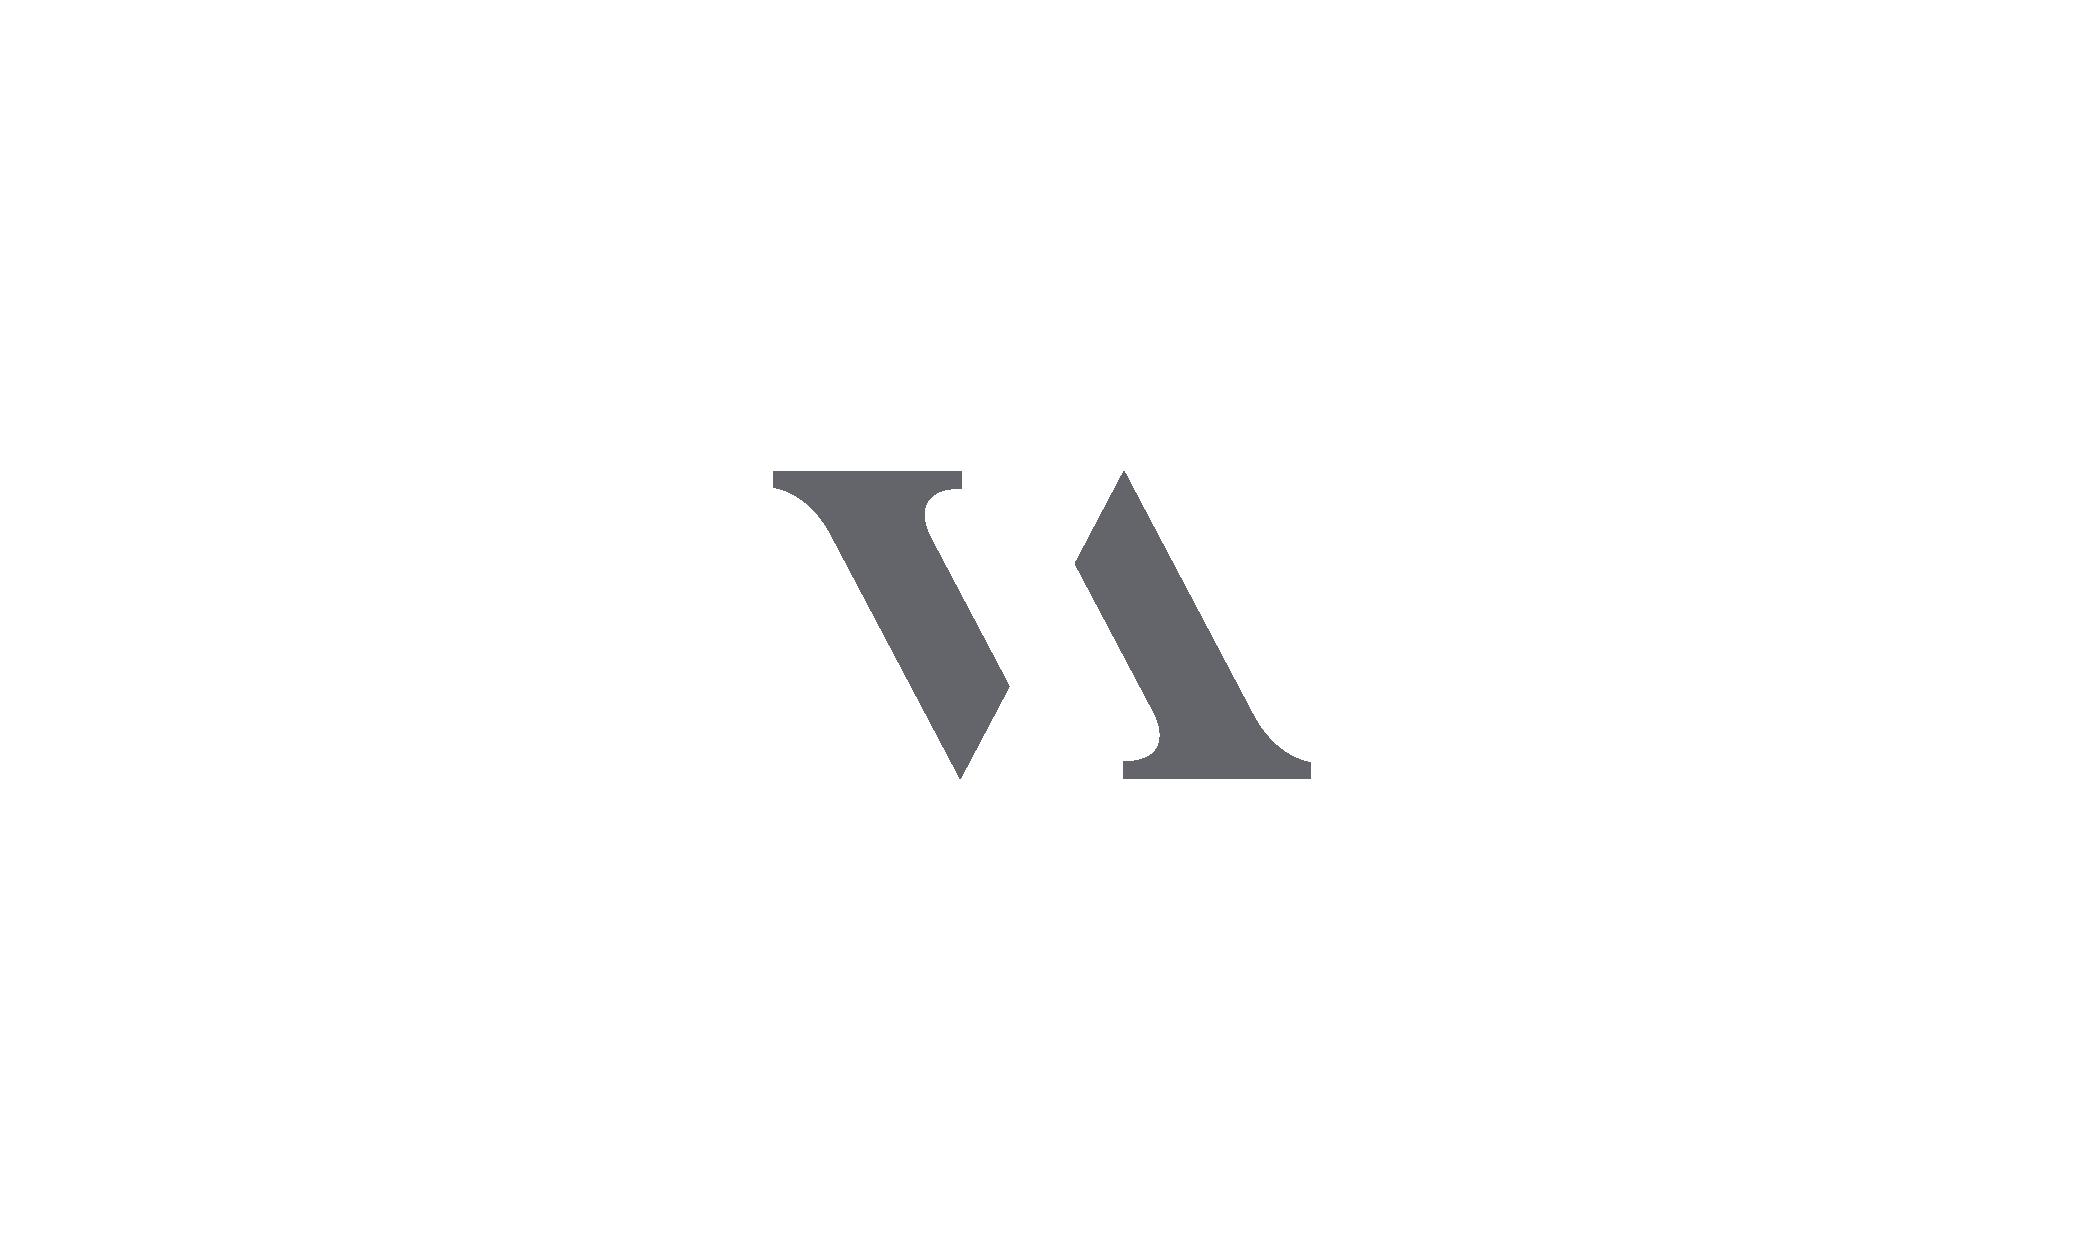 Kinetik_Client_Logos-09